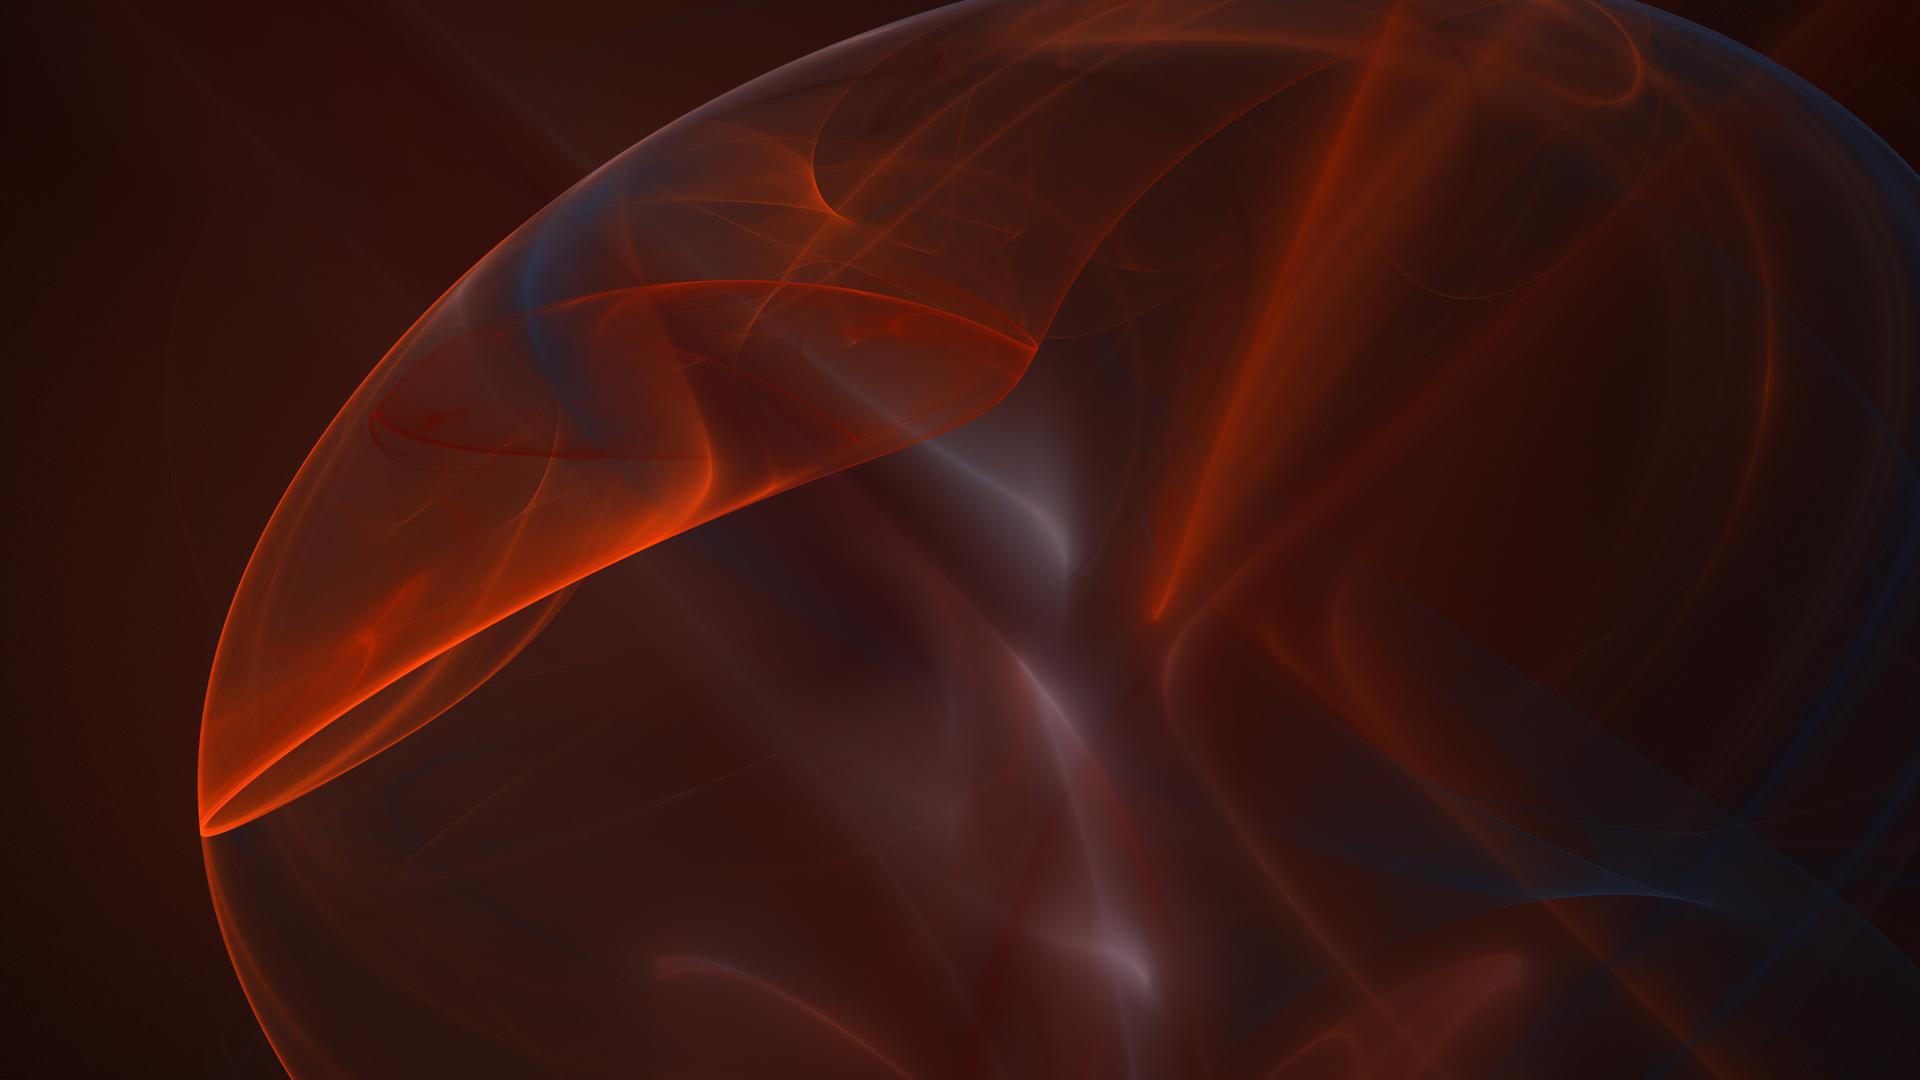 apophysis-3d-fractal-digital-art-4k-8d.jpg